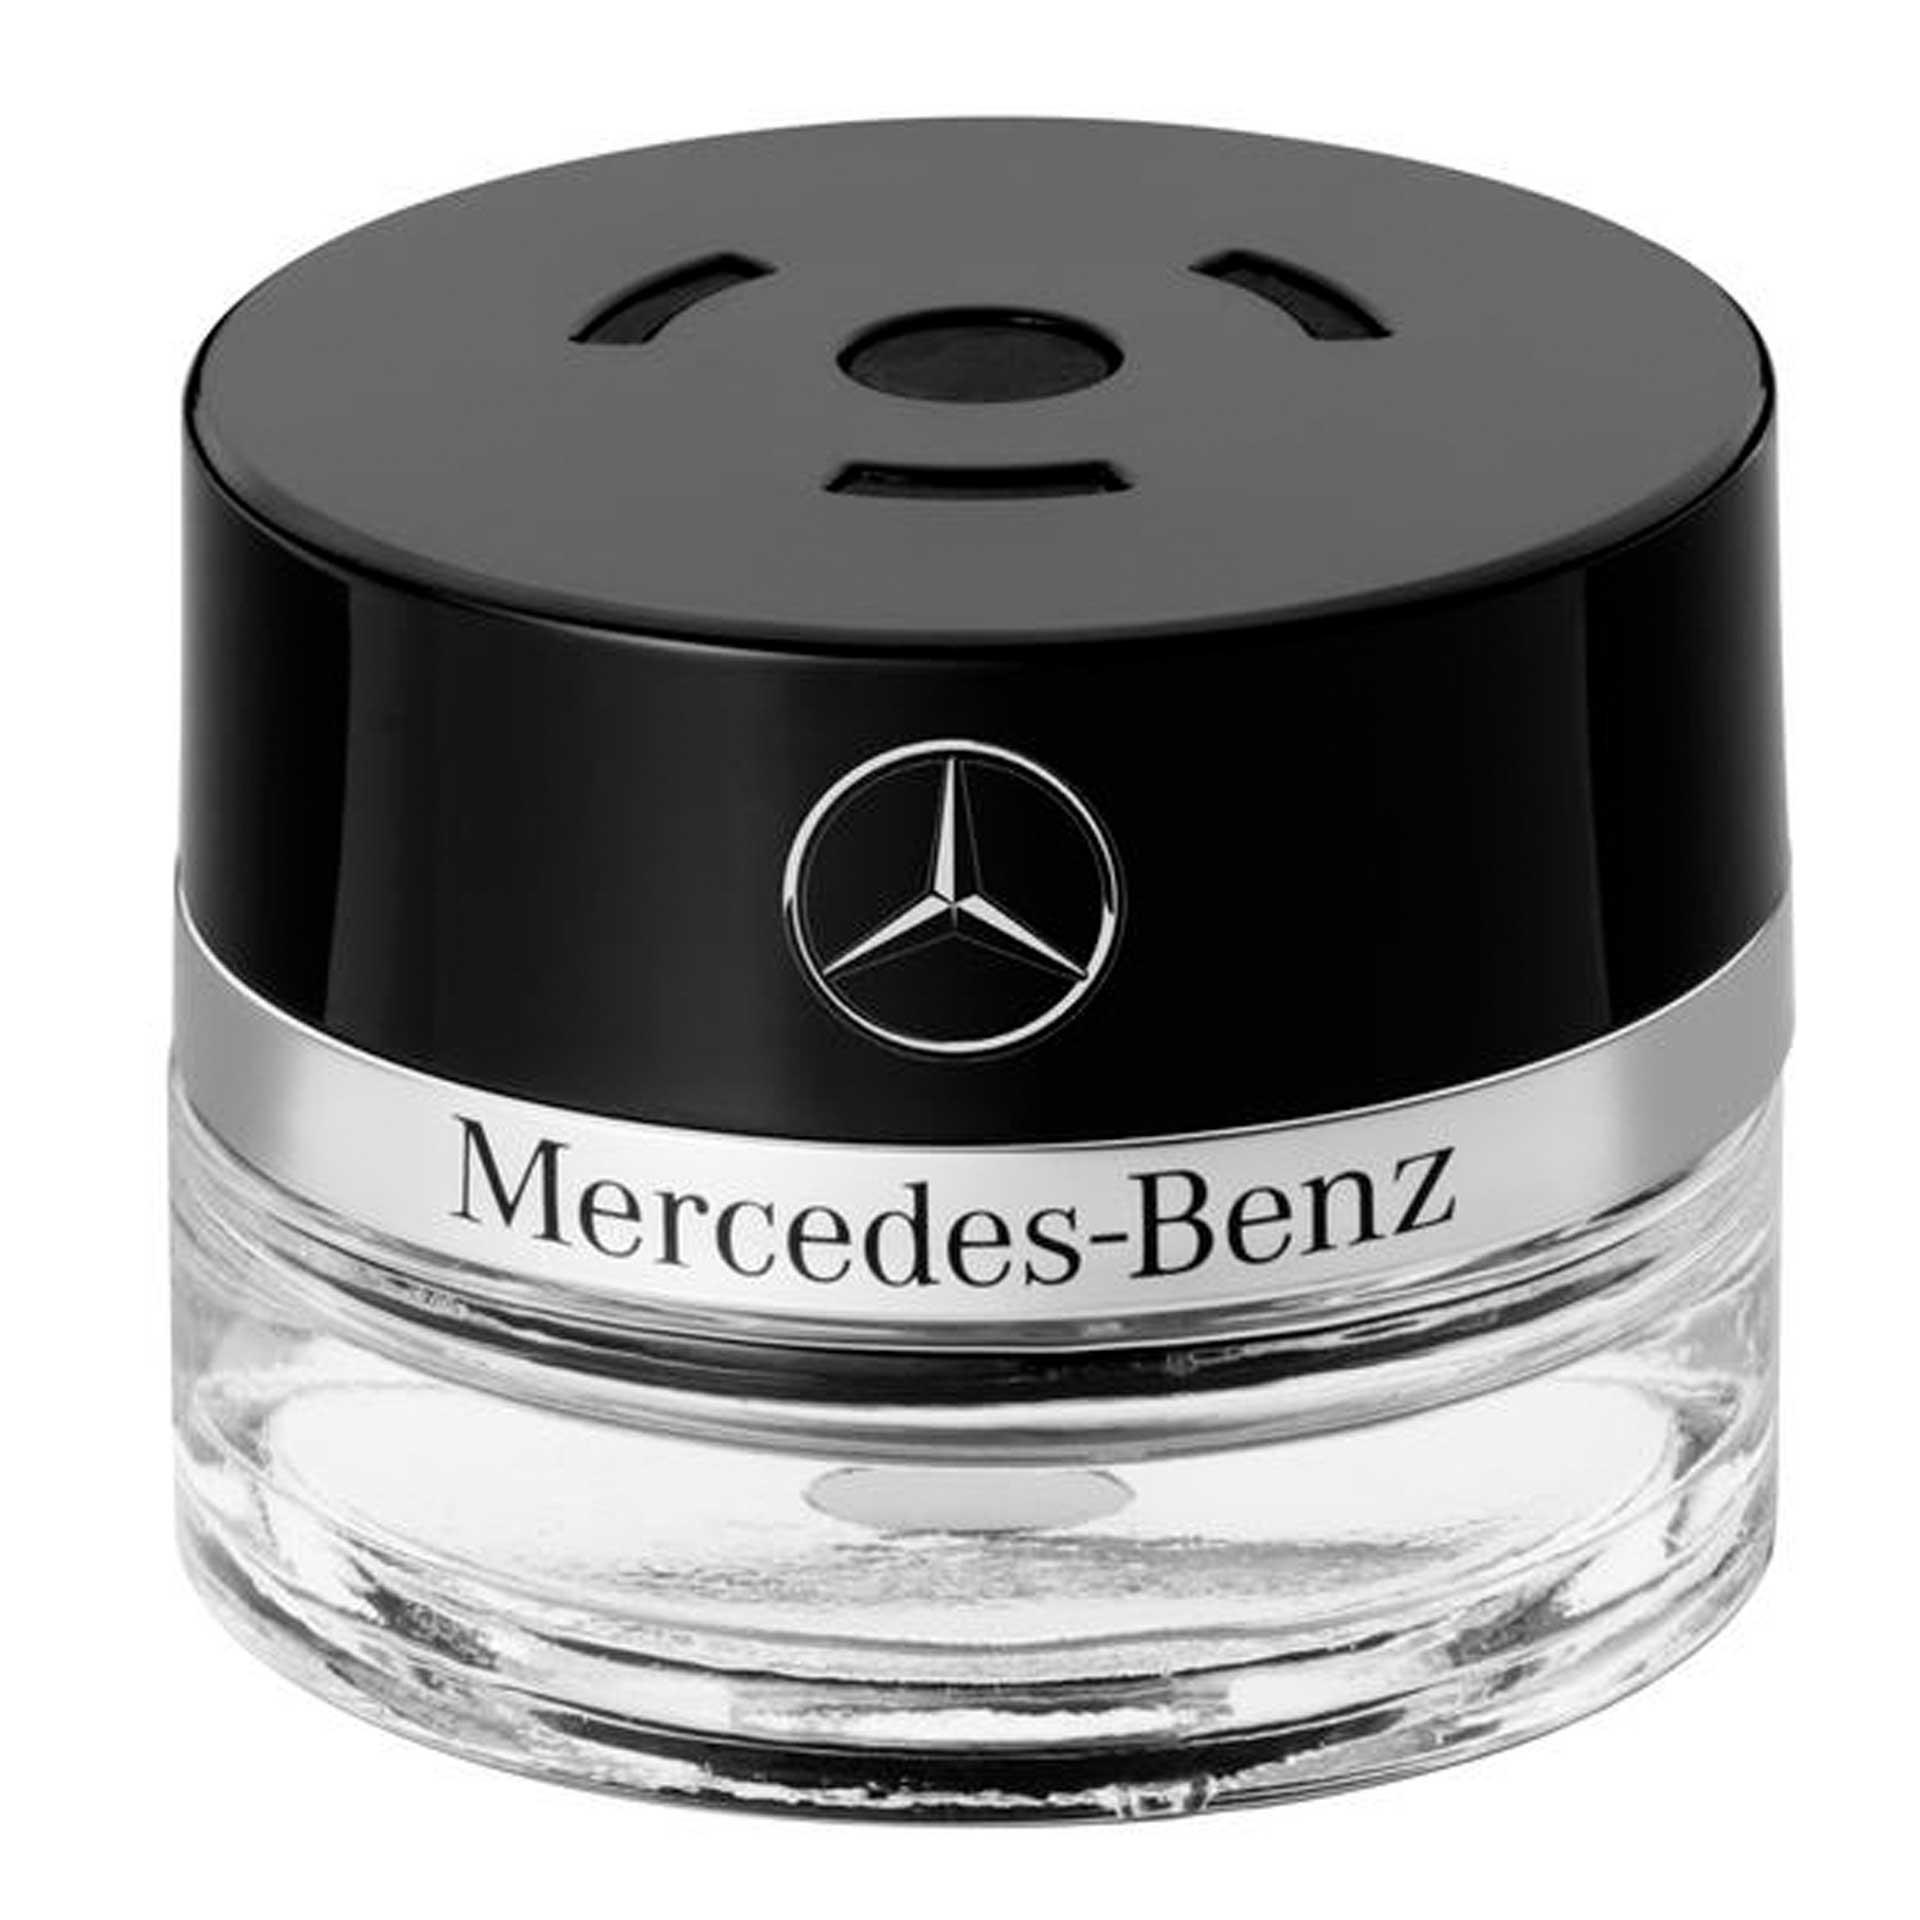 Mercedes-Benz Flakon 15 ml 1001 MOOD  für AIR-BALANCE Paket